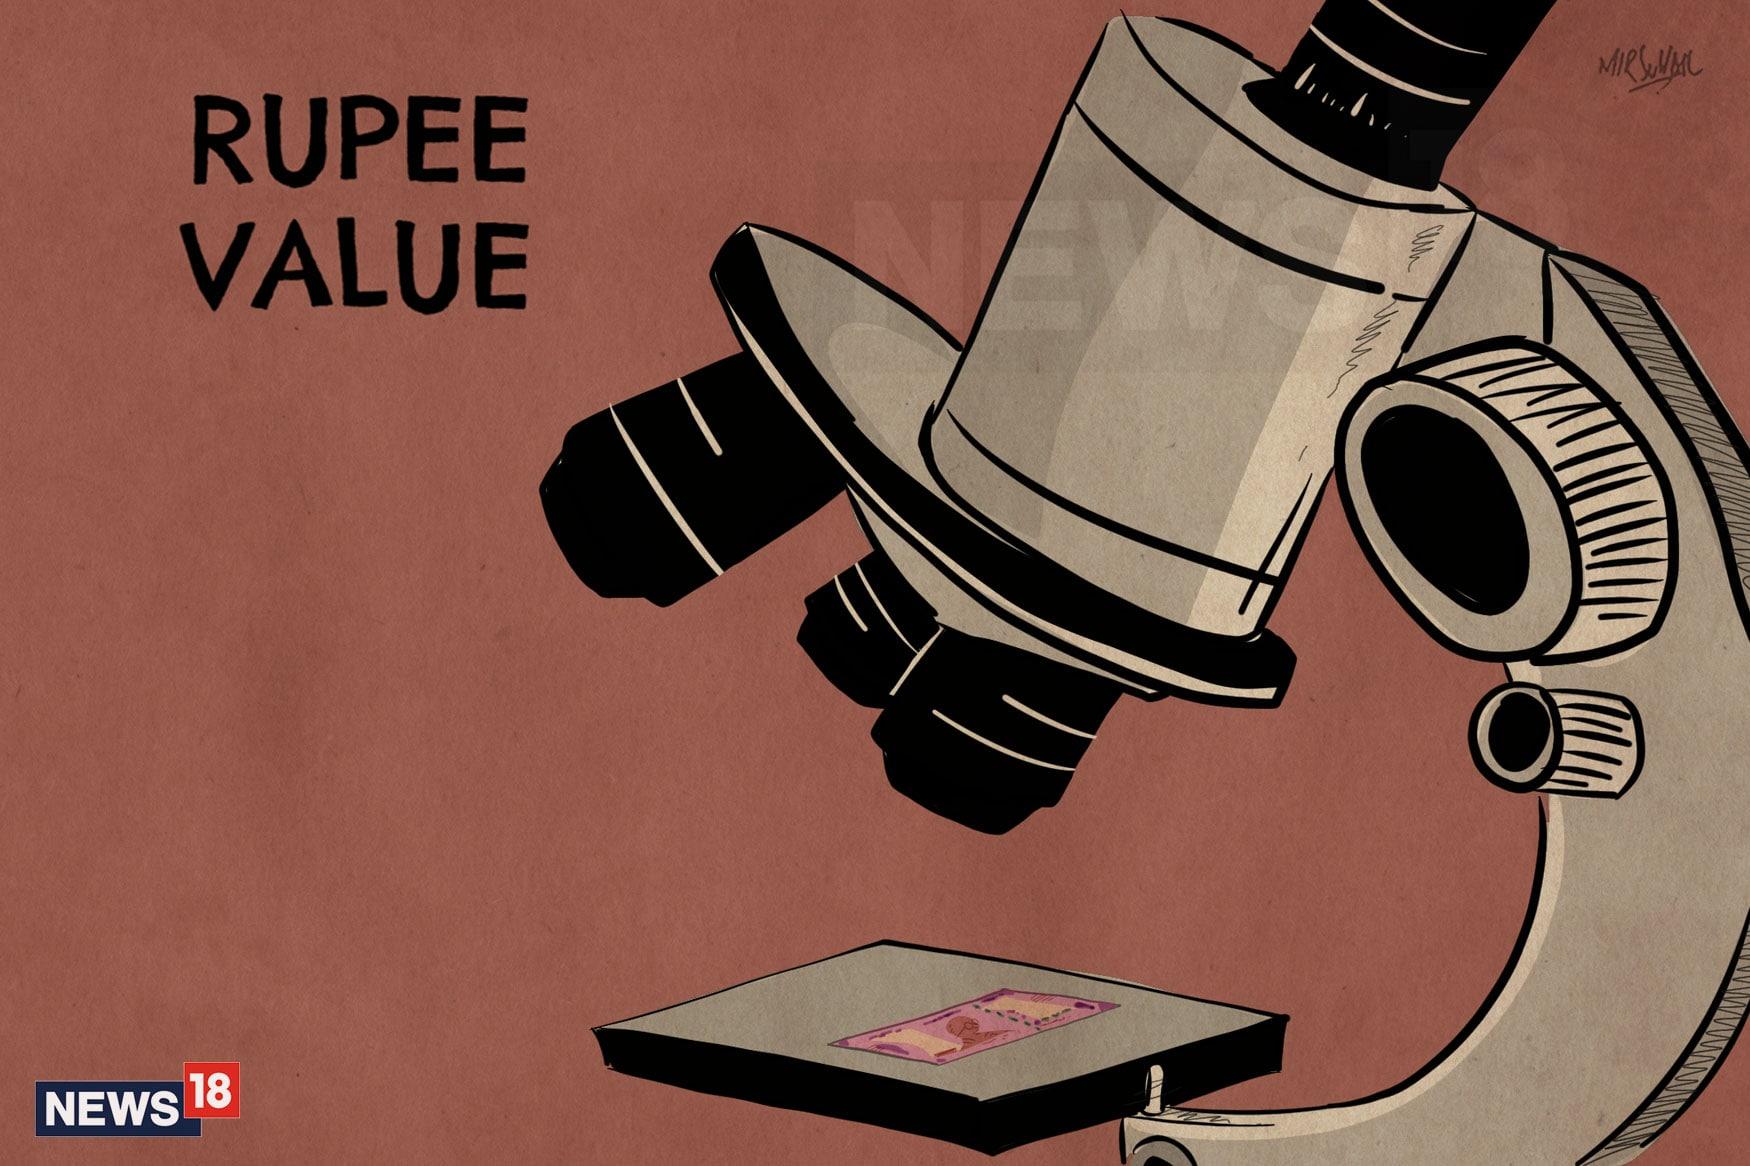 Rupee-value-cartoon